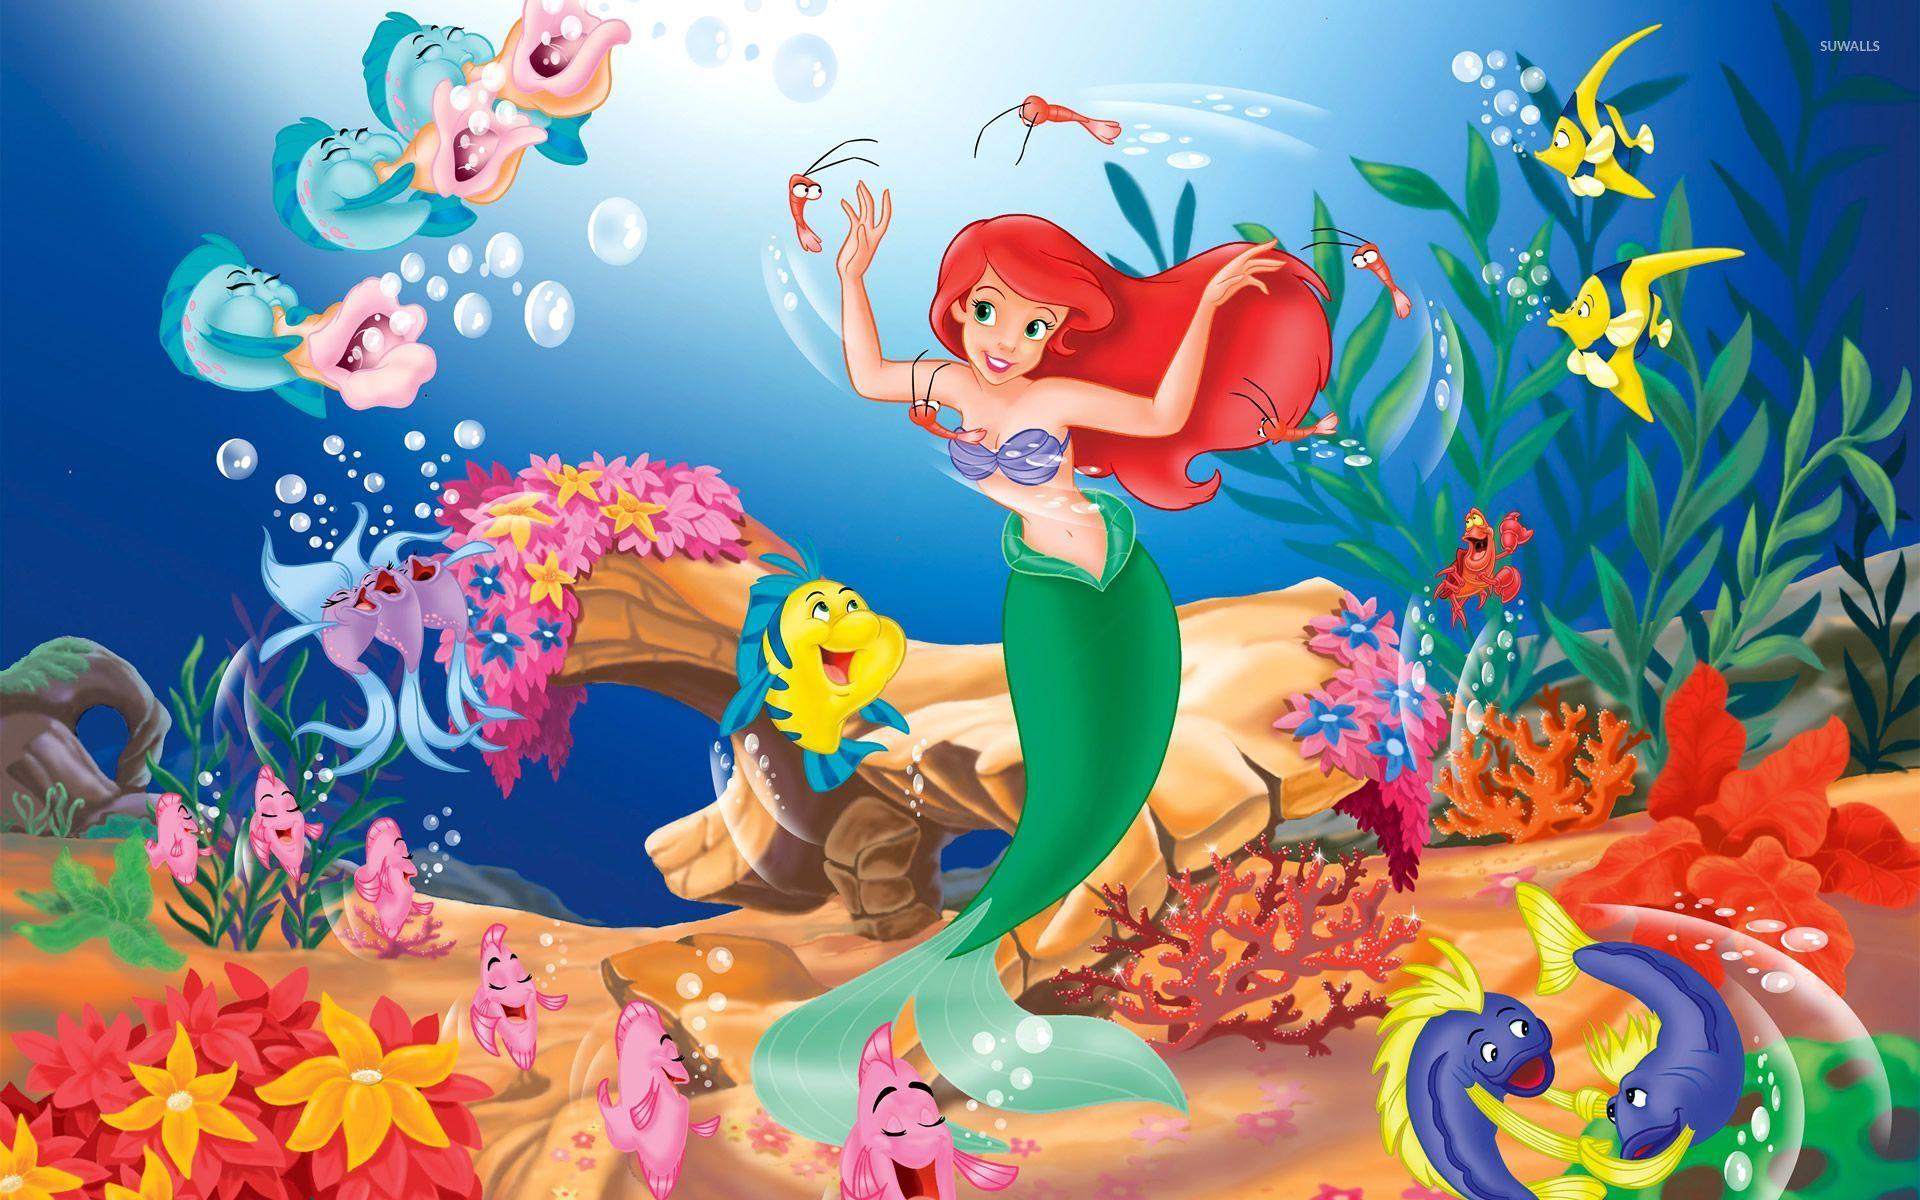 The Little Mermaid Wallpaper Cartoon Wallpapers 12021